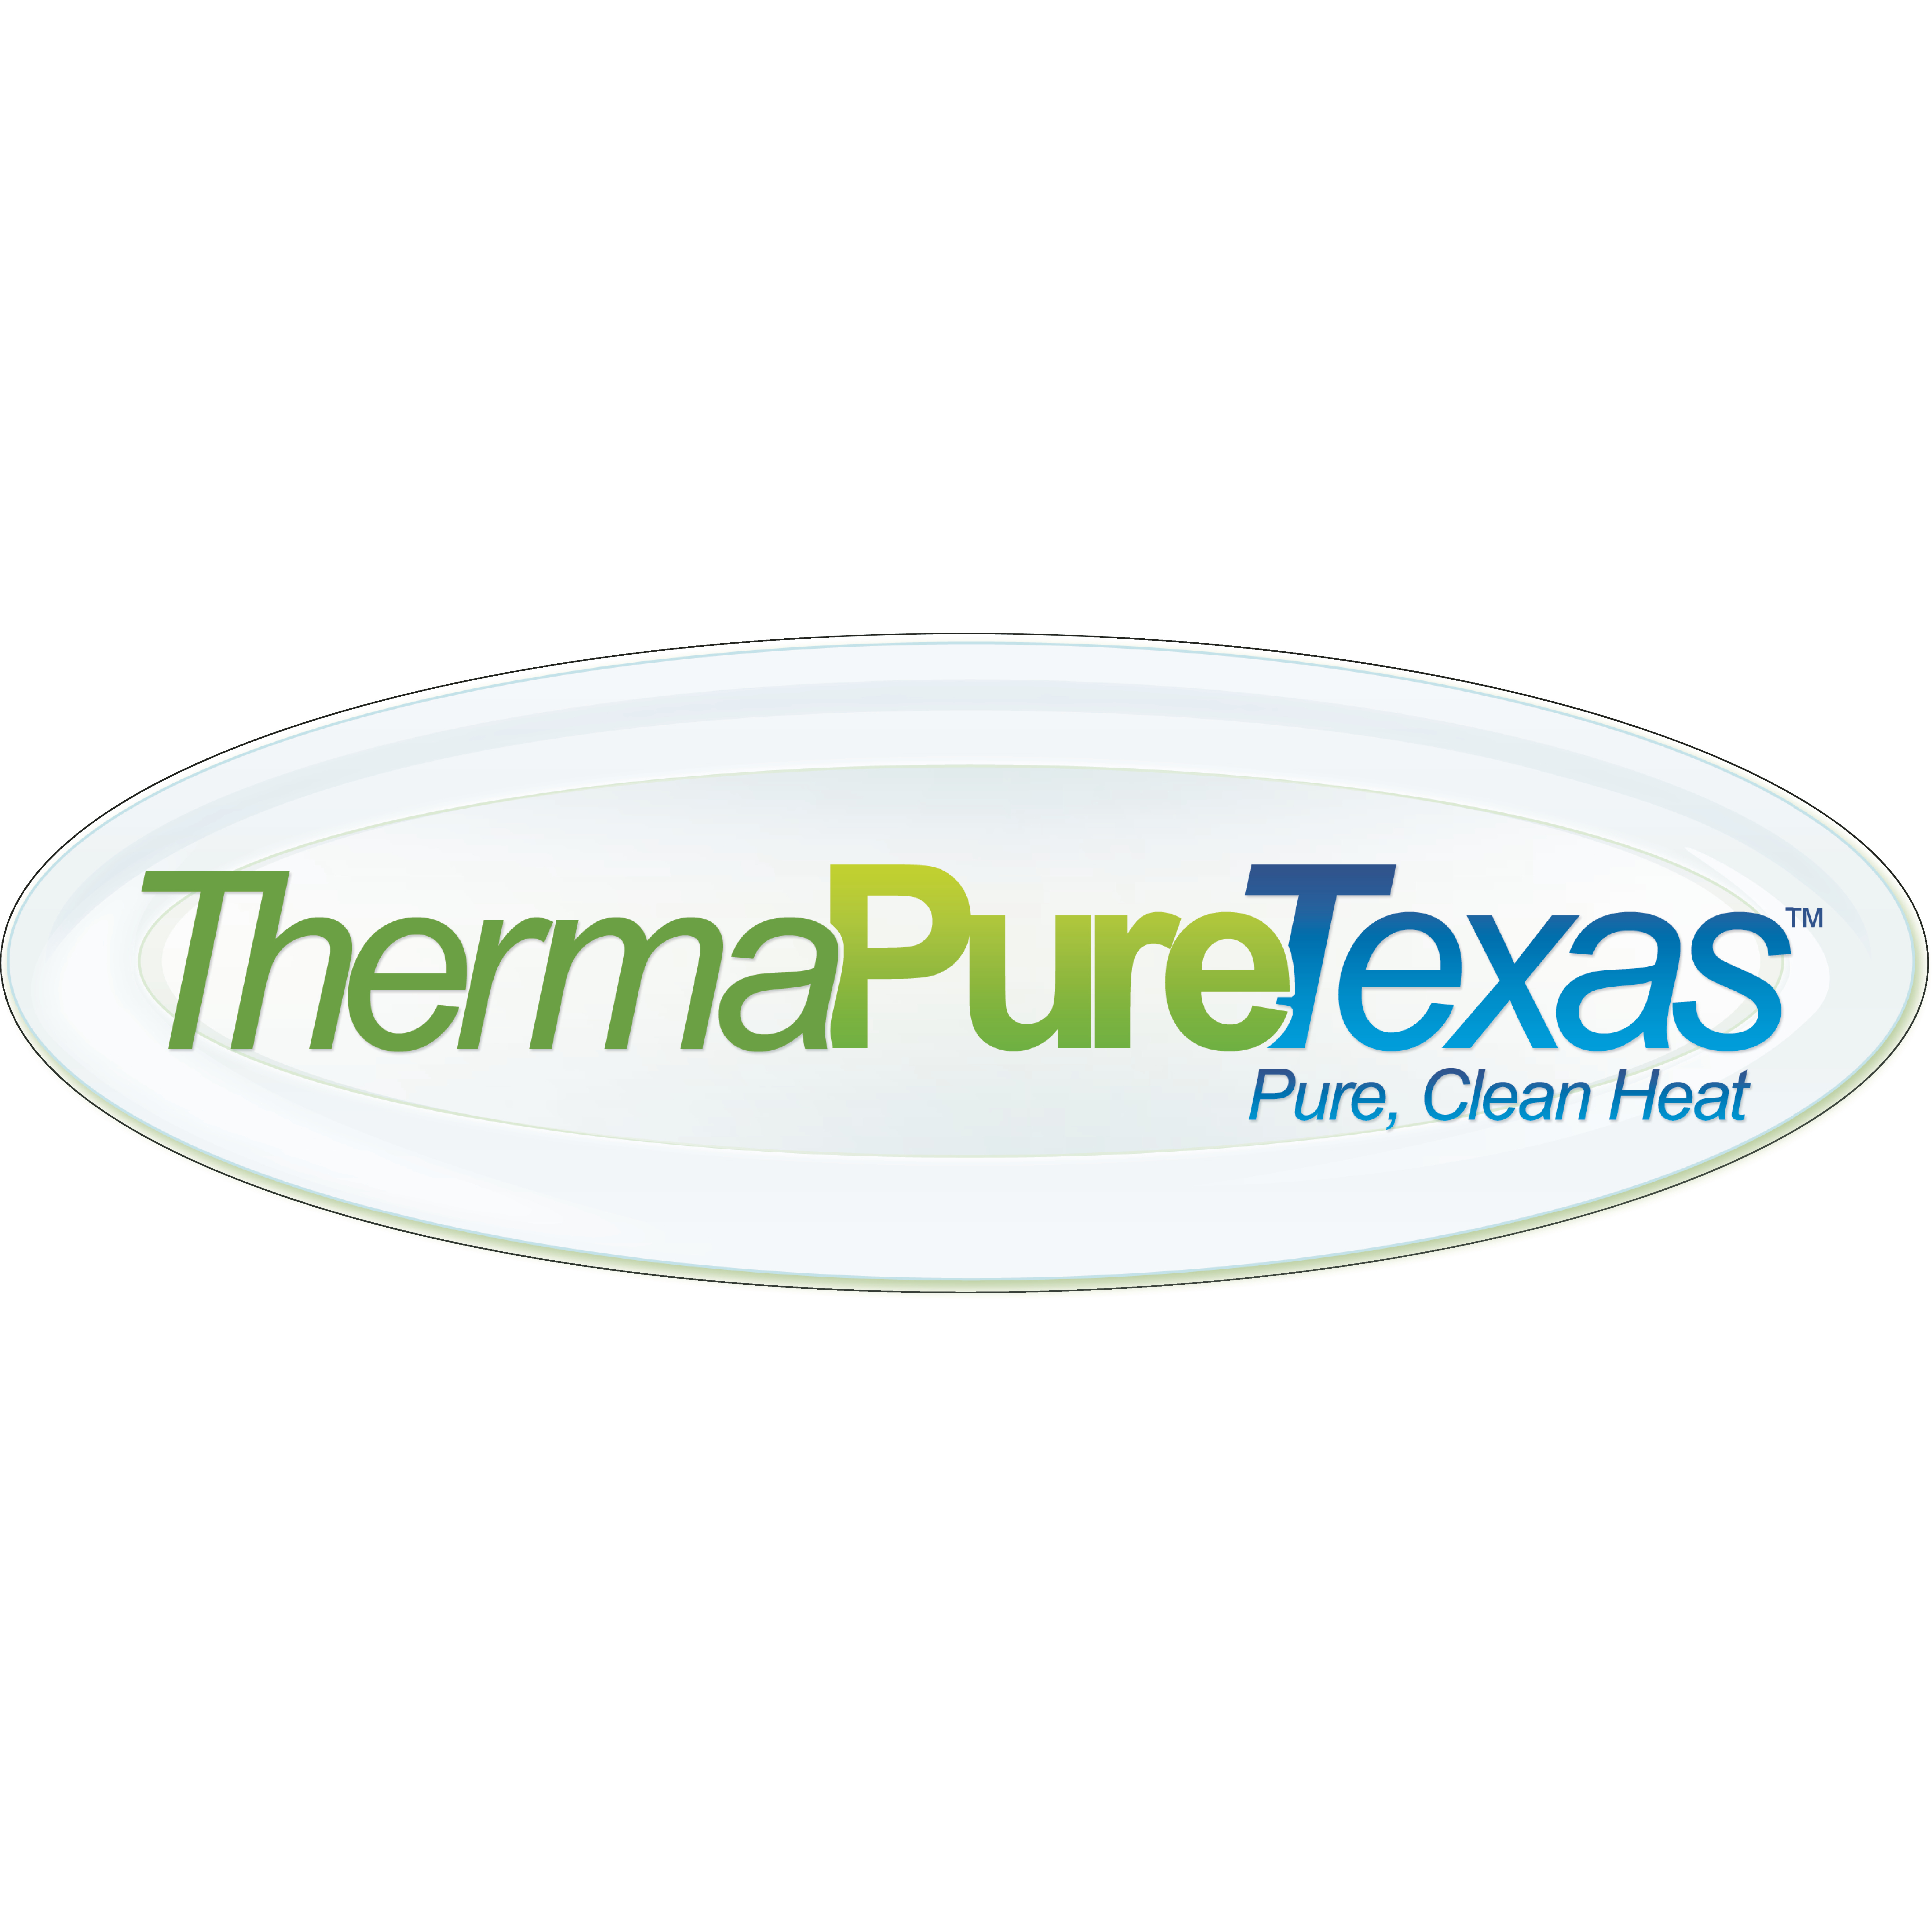 ThermaPure Texas